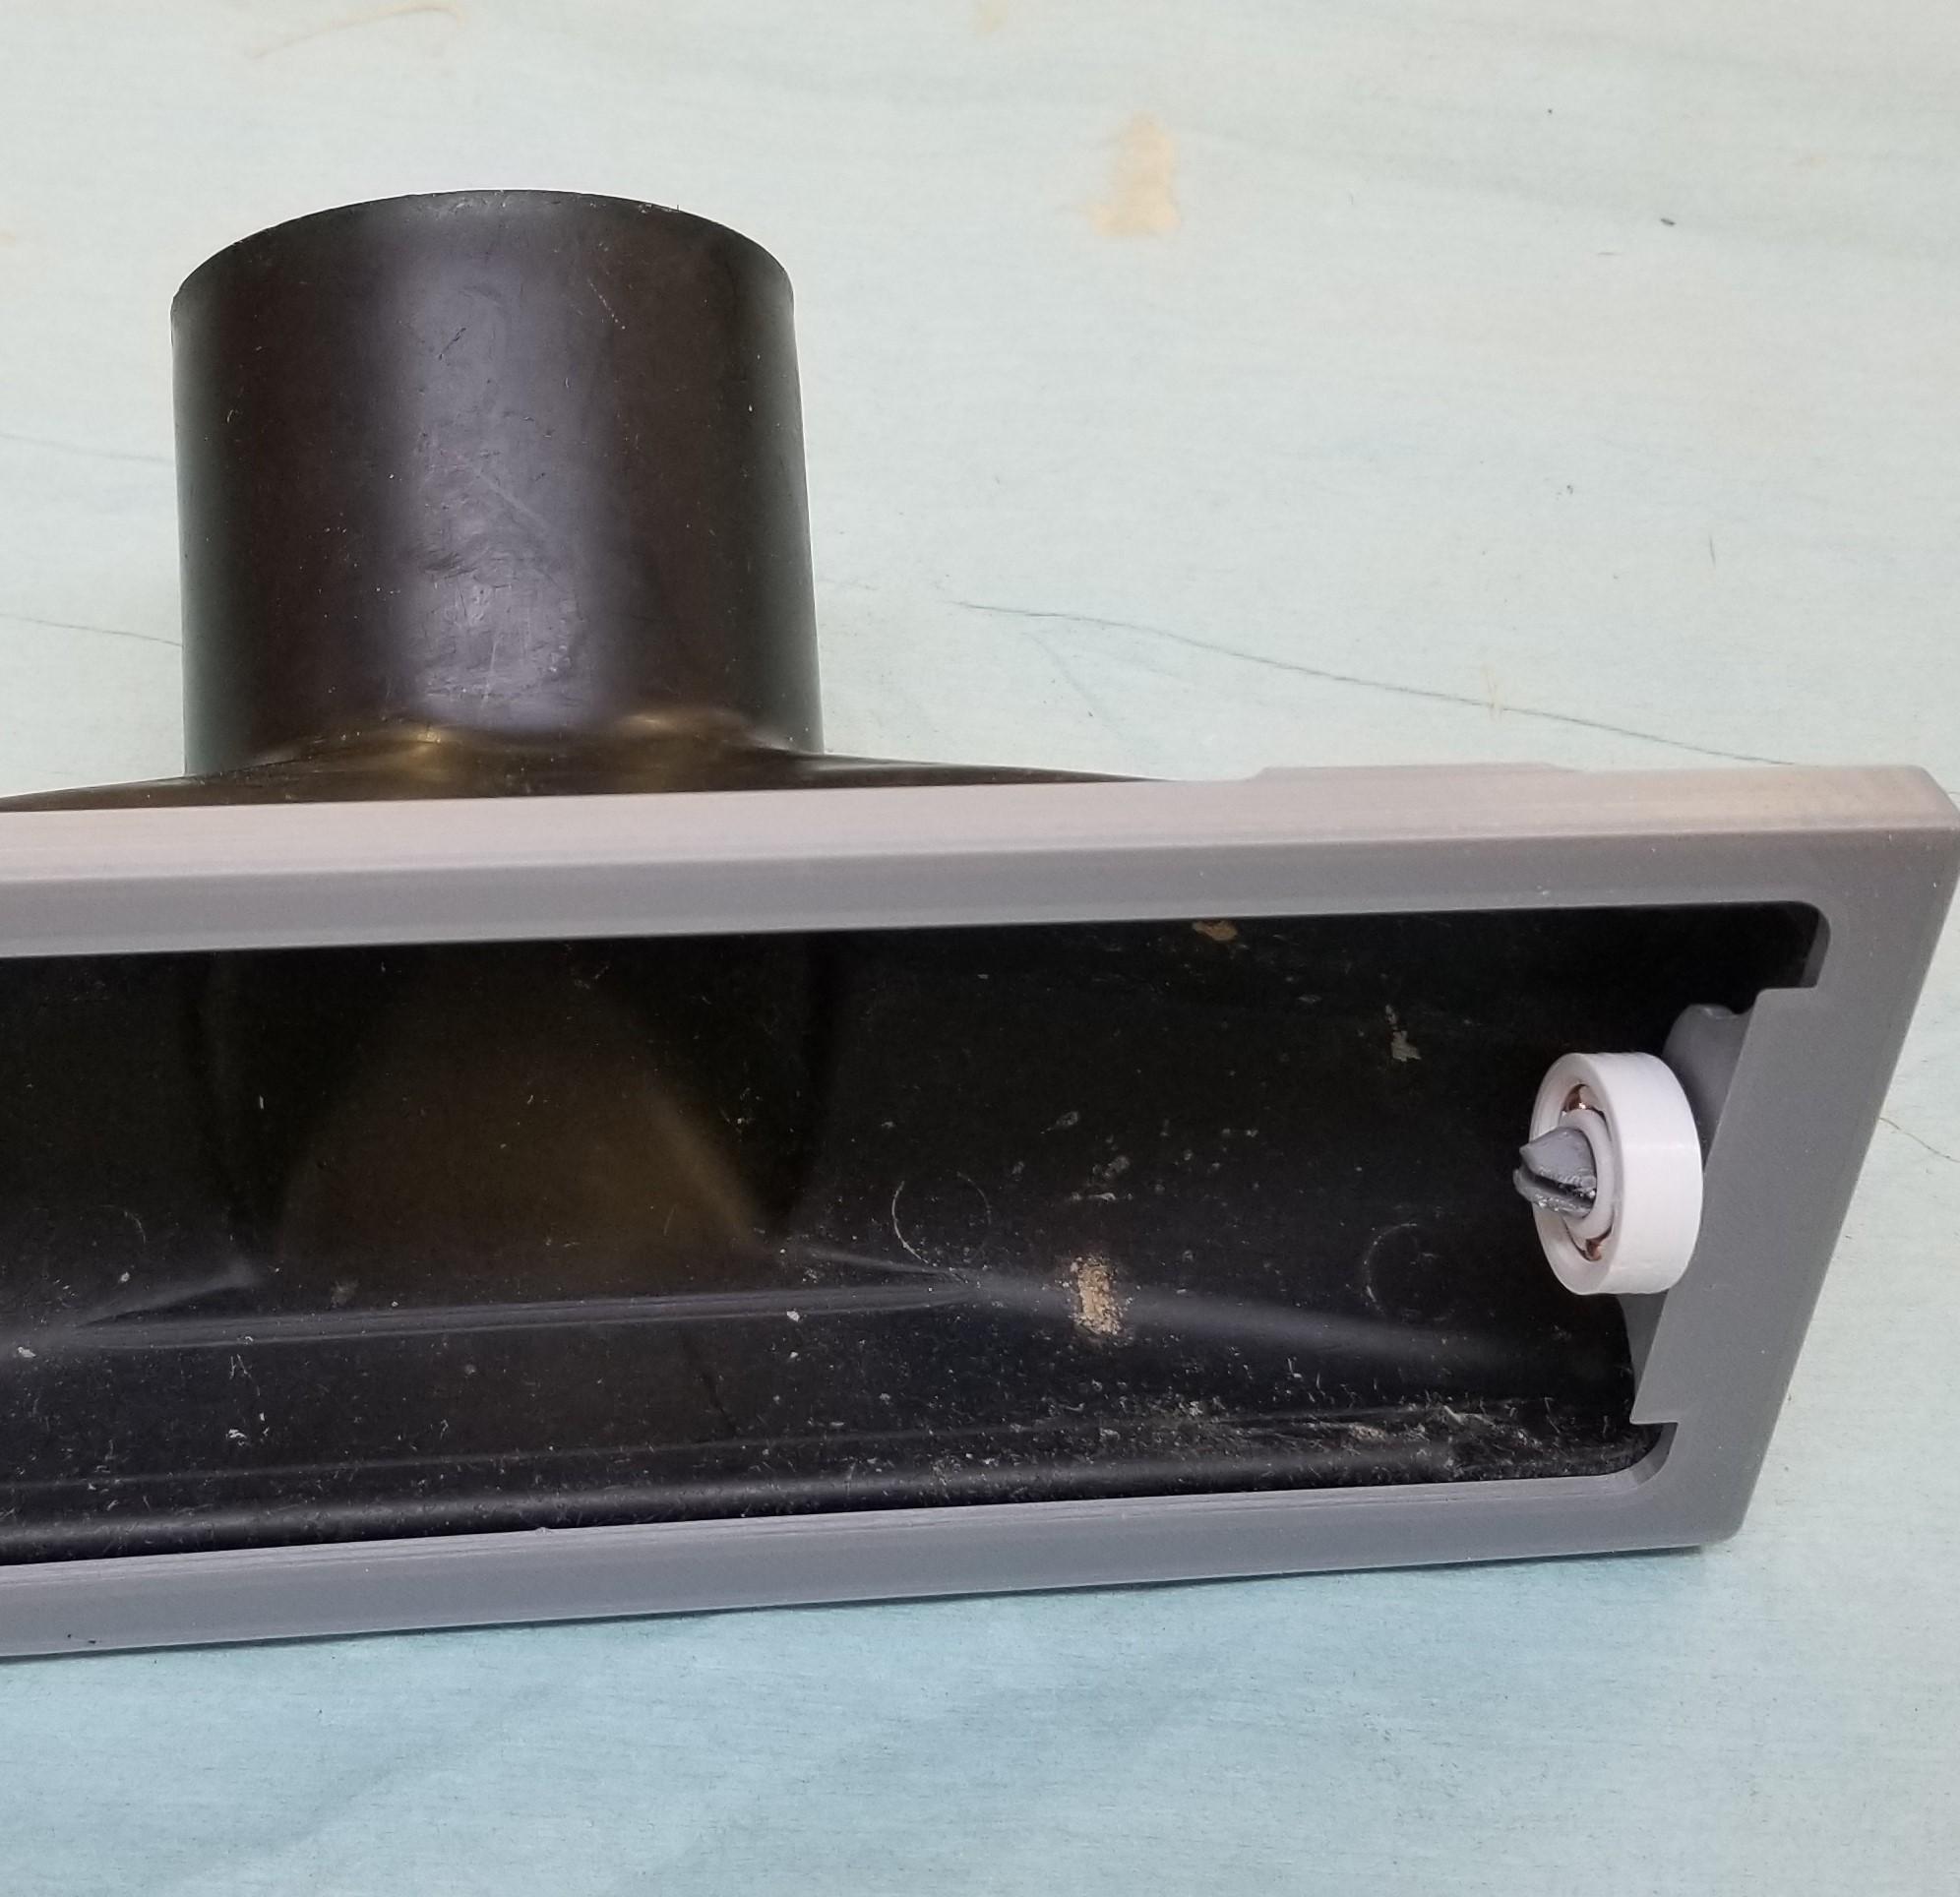 20190930_160021 (3).jpg Download free STL file Ridgid Vacuum Nozzle Wheels • Template to 3D print, jimjax